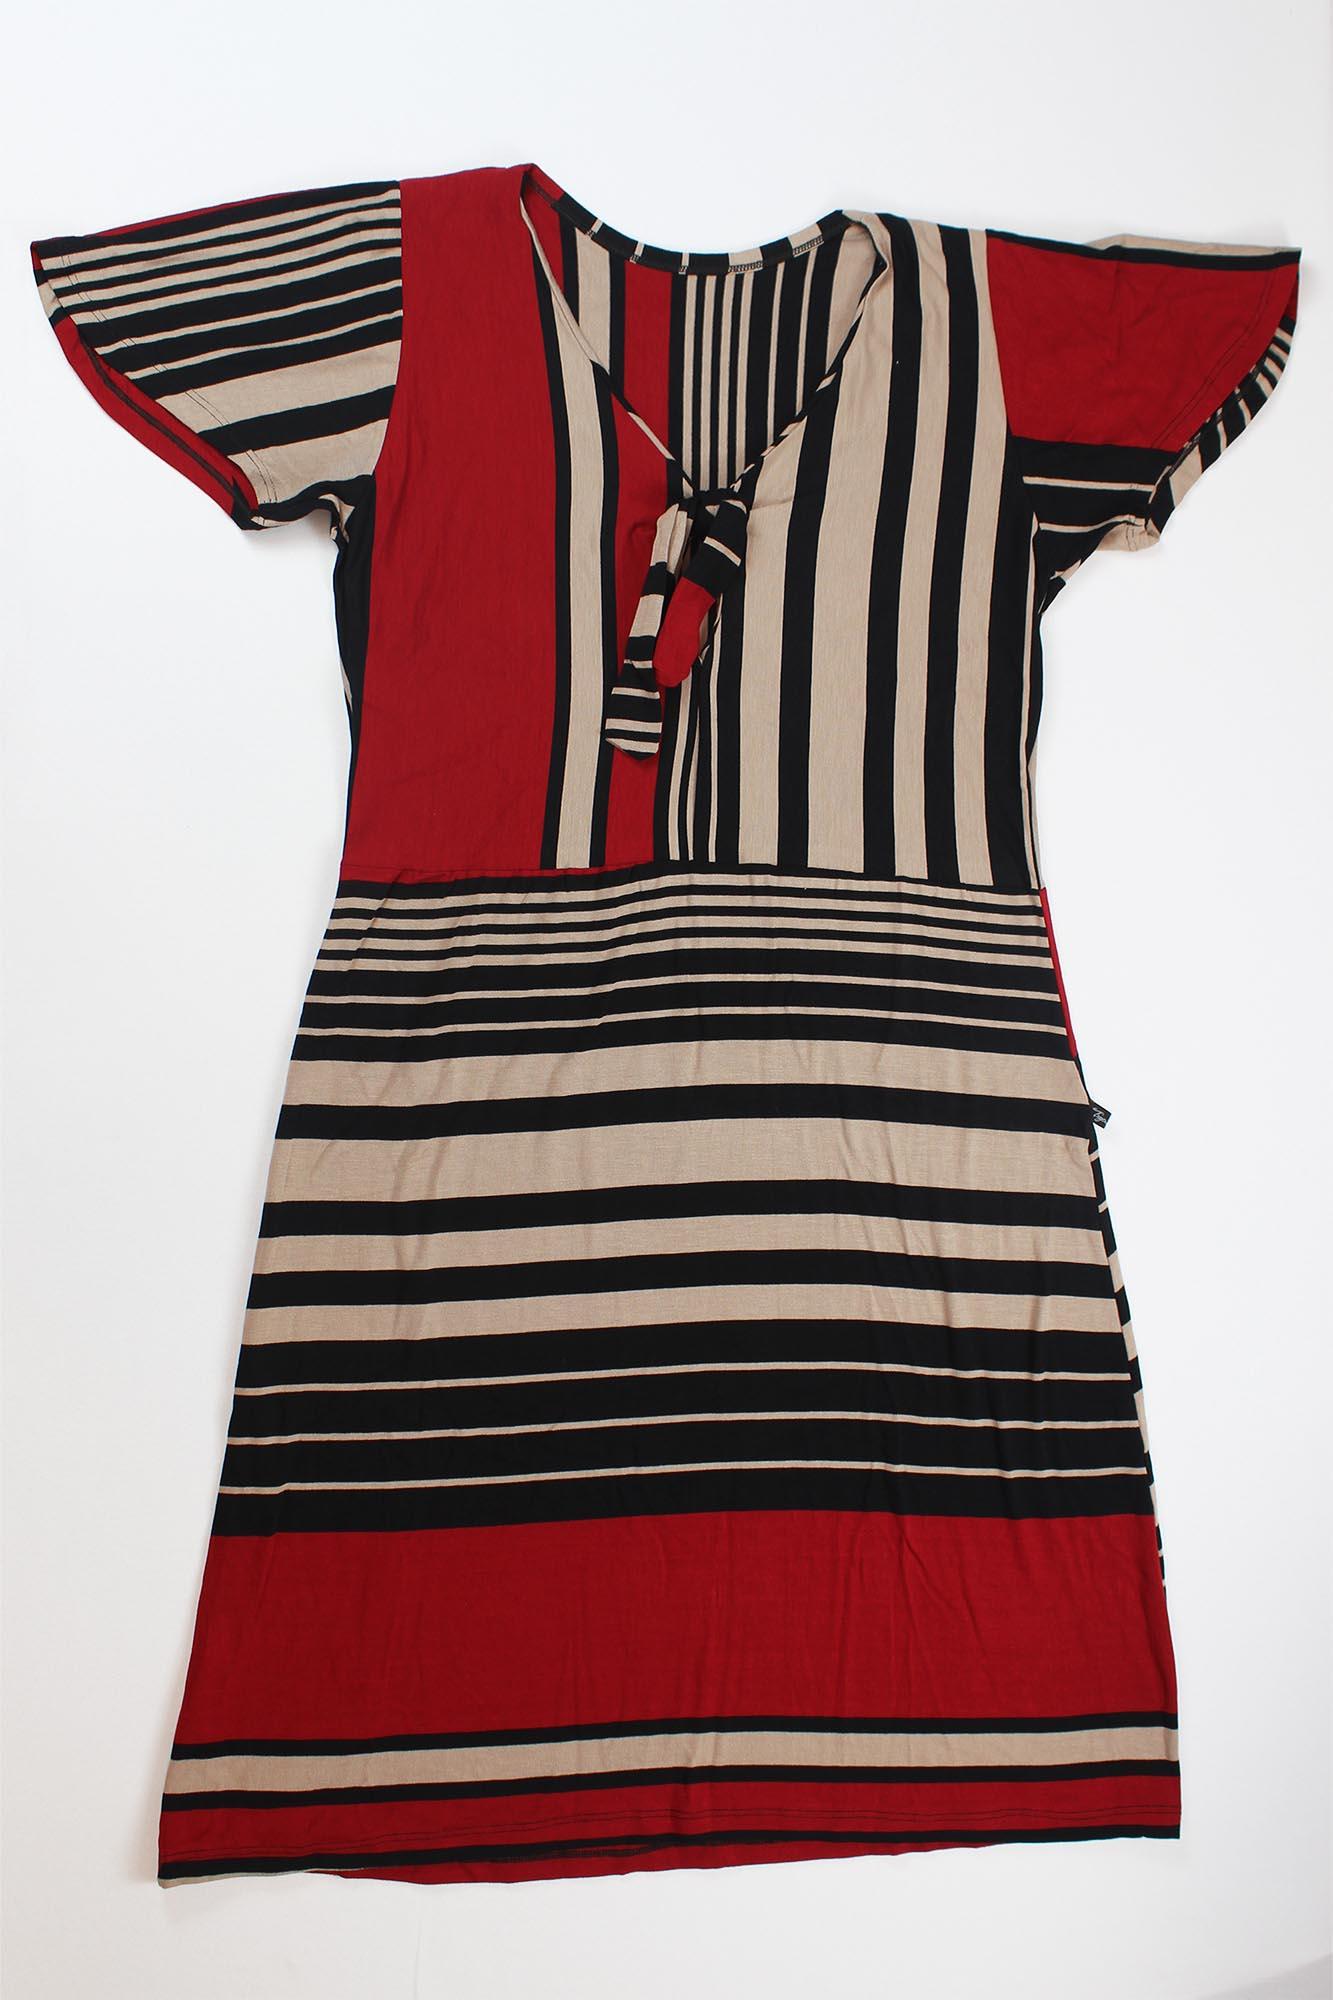 Vestido Curto Listrado Laço Decote Feminino - Terracota e Preto